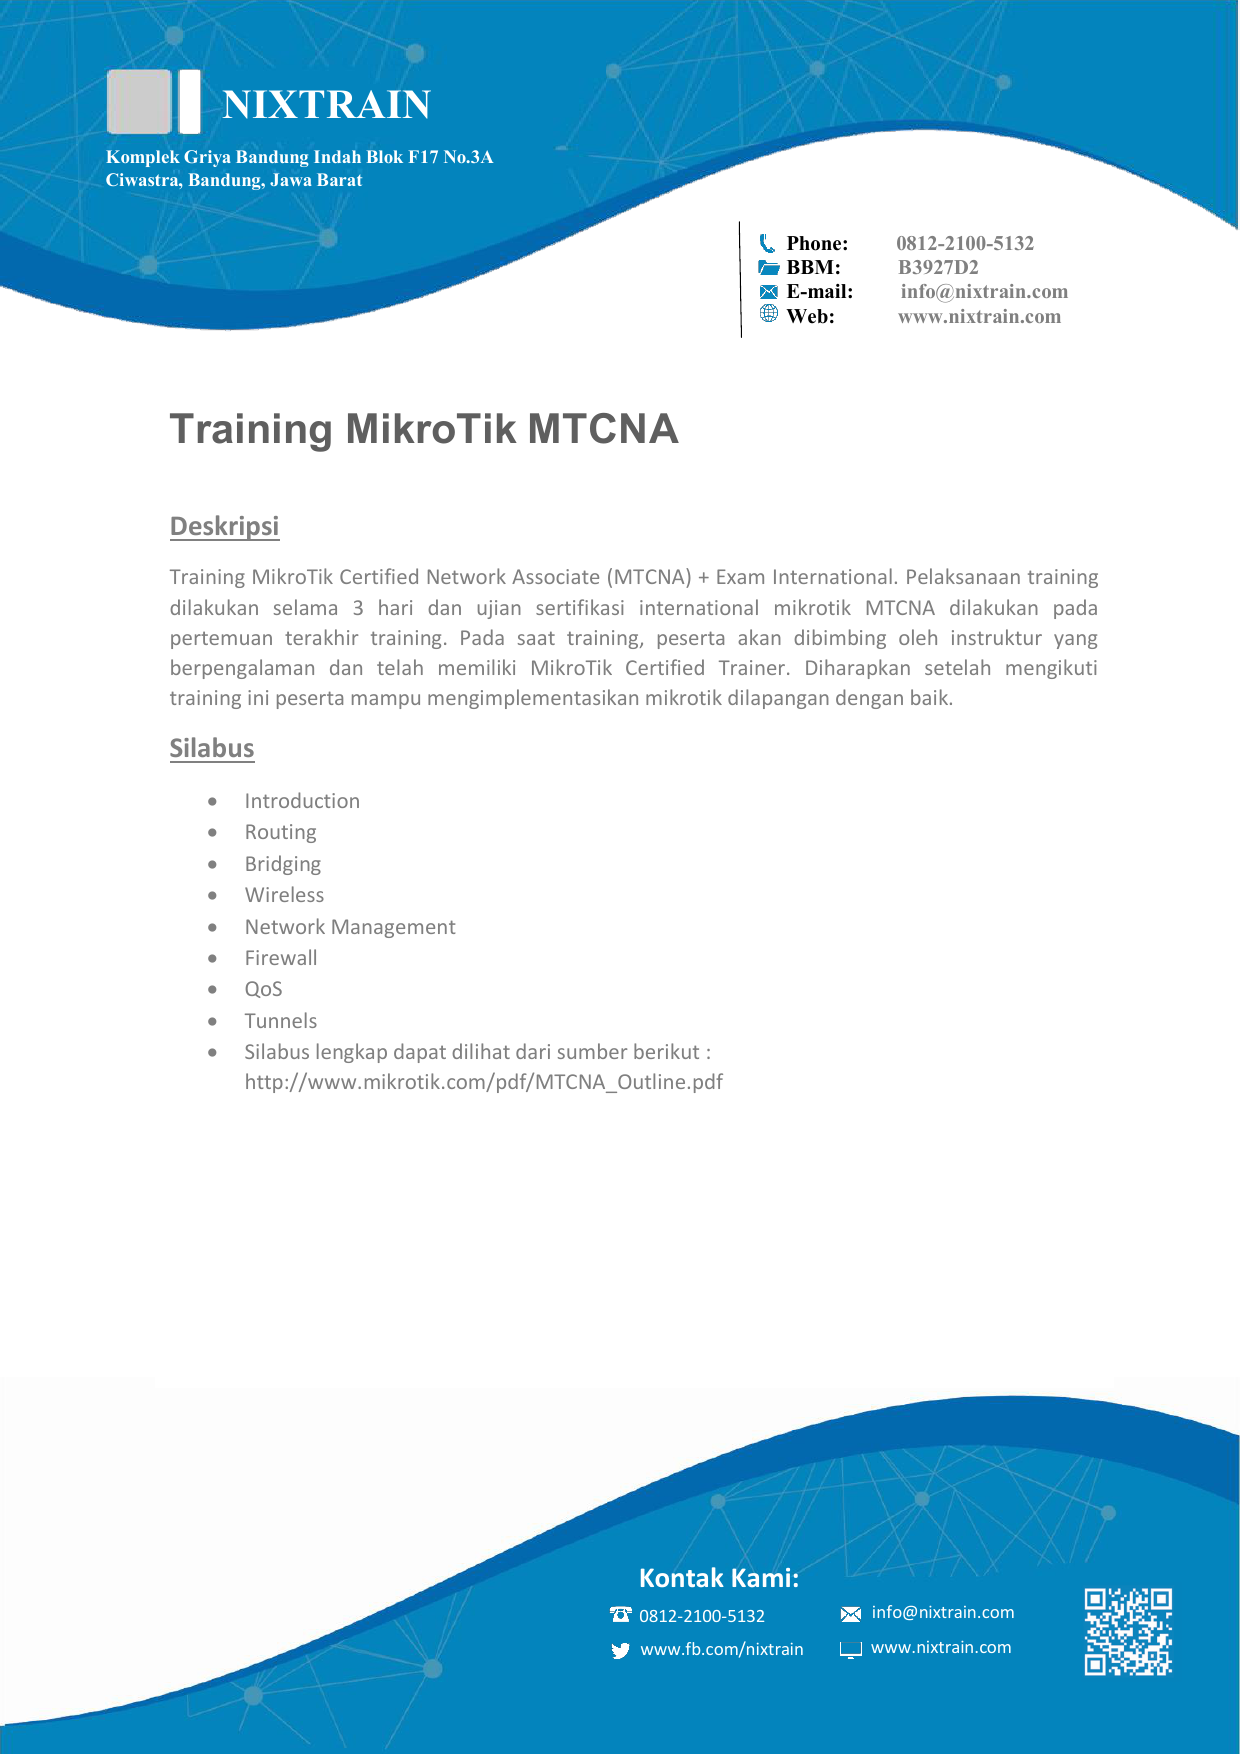 silabus-training-mtcna-fasttrack-nixtrain